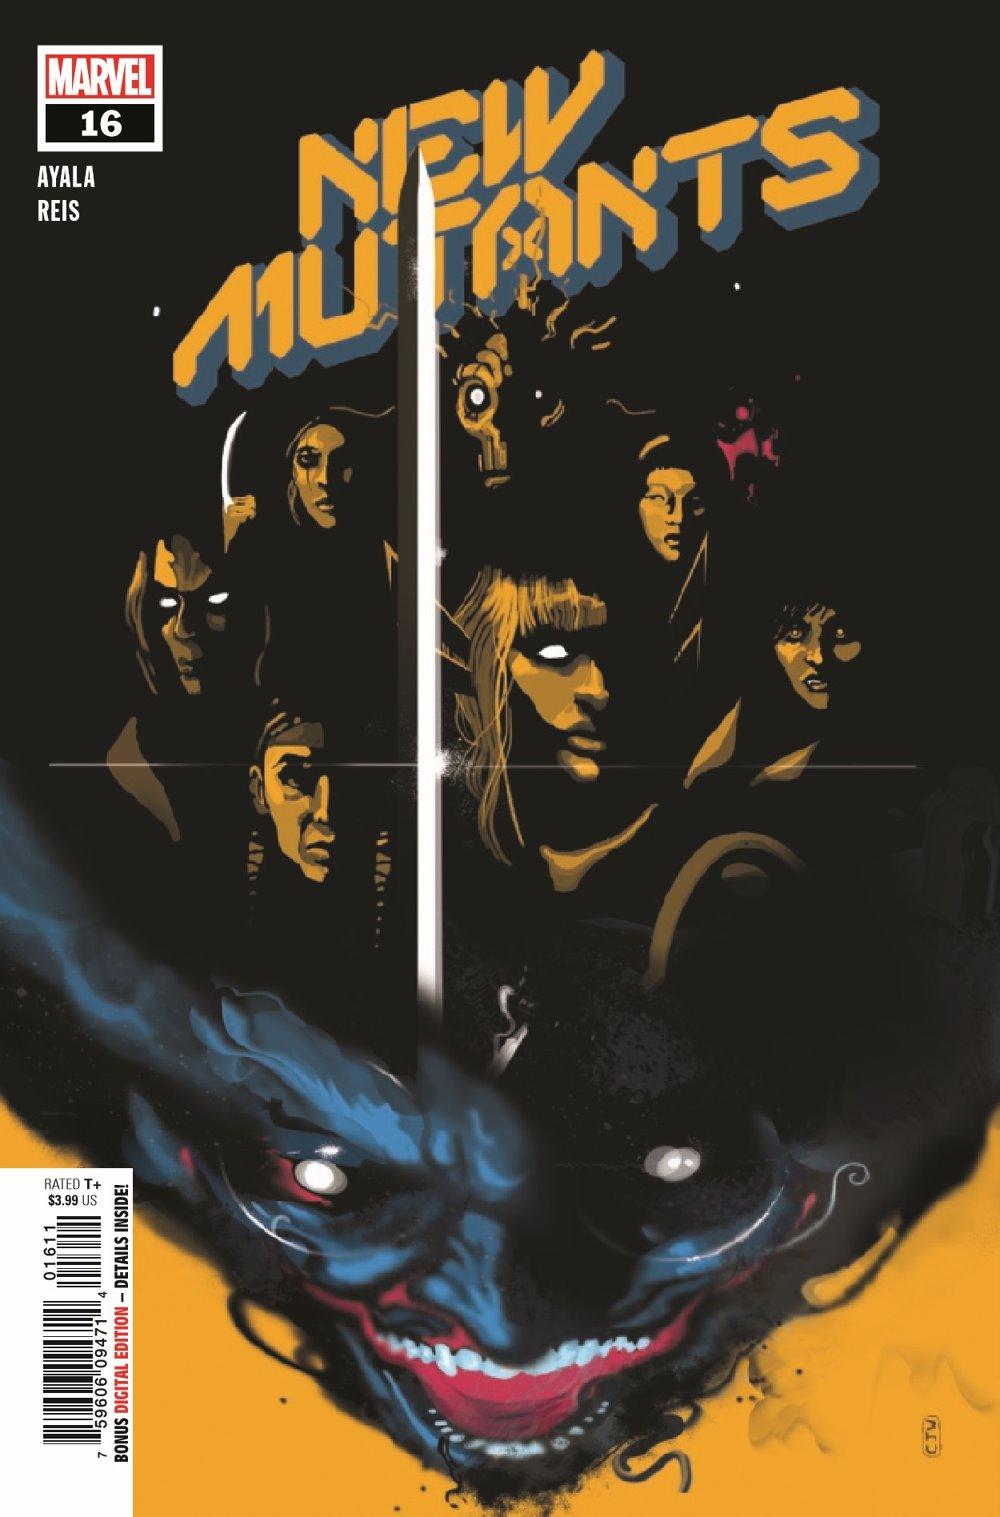 NEWMUT2019016_Preview-1 ComicList Previews: NEW MUTANTS #16